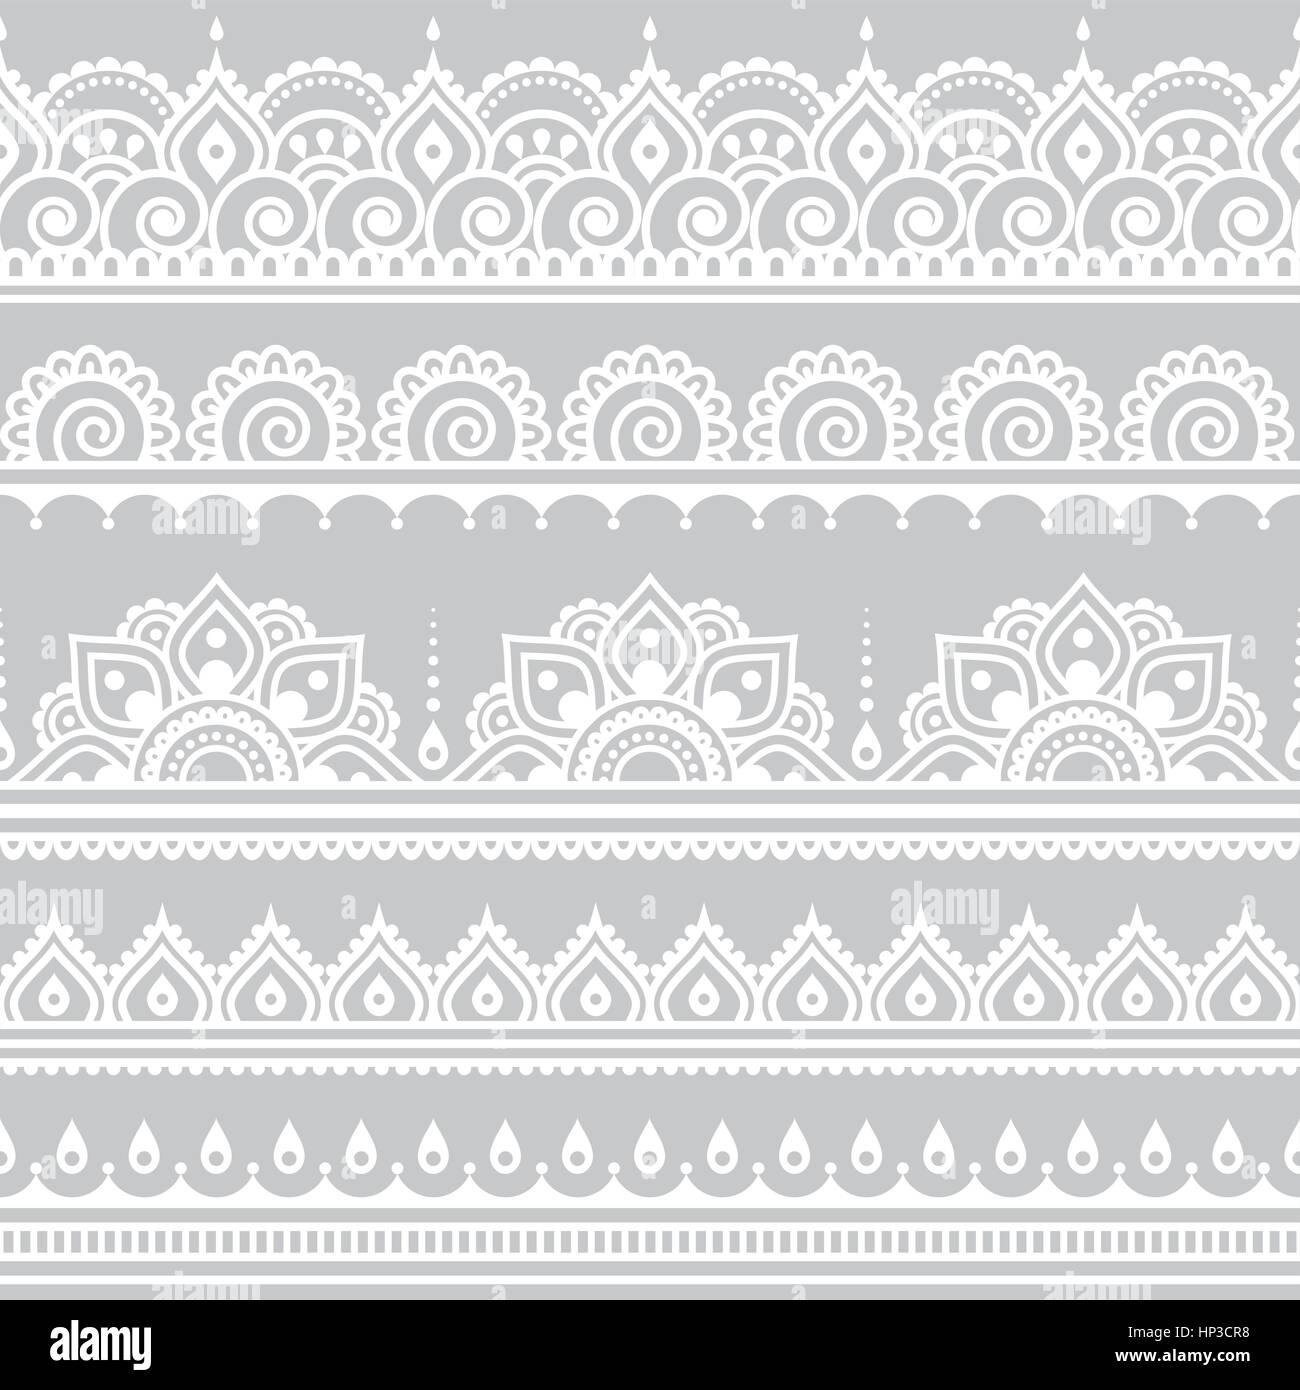 Mehndi Indian Henna Tattoo Seamless White Pattern On Grey